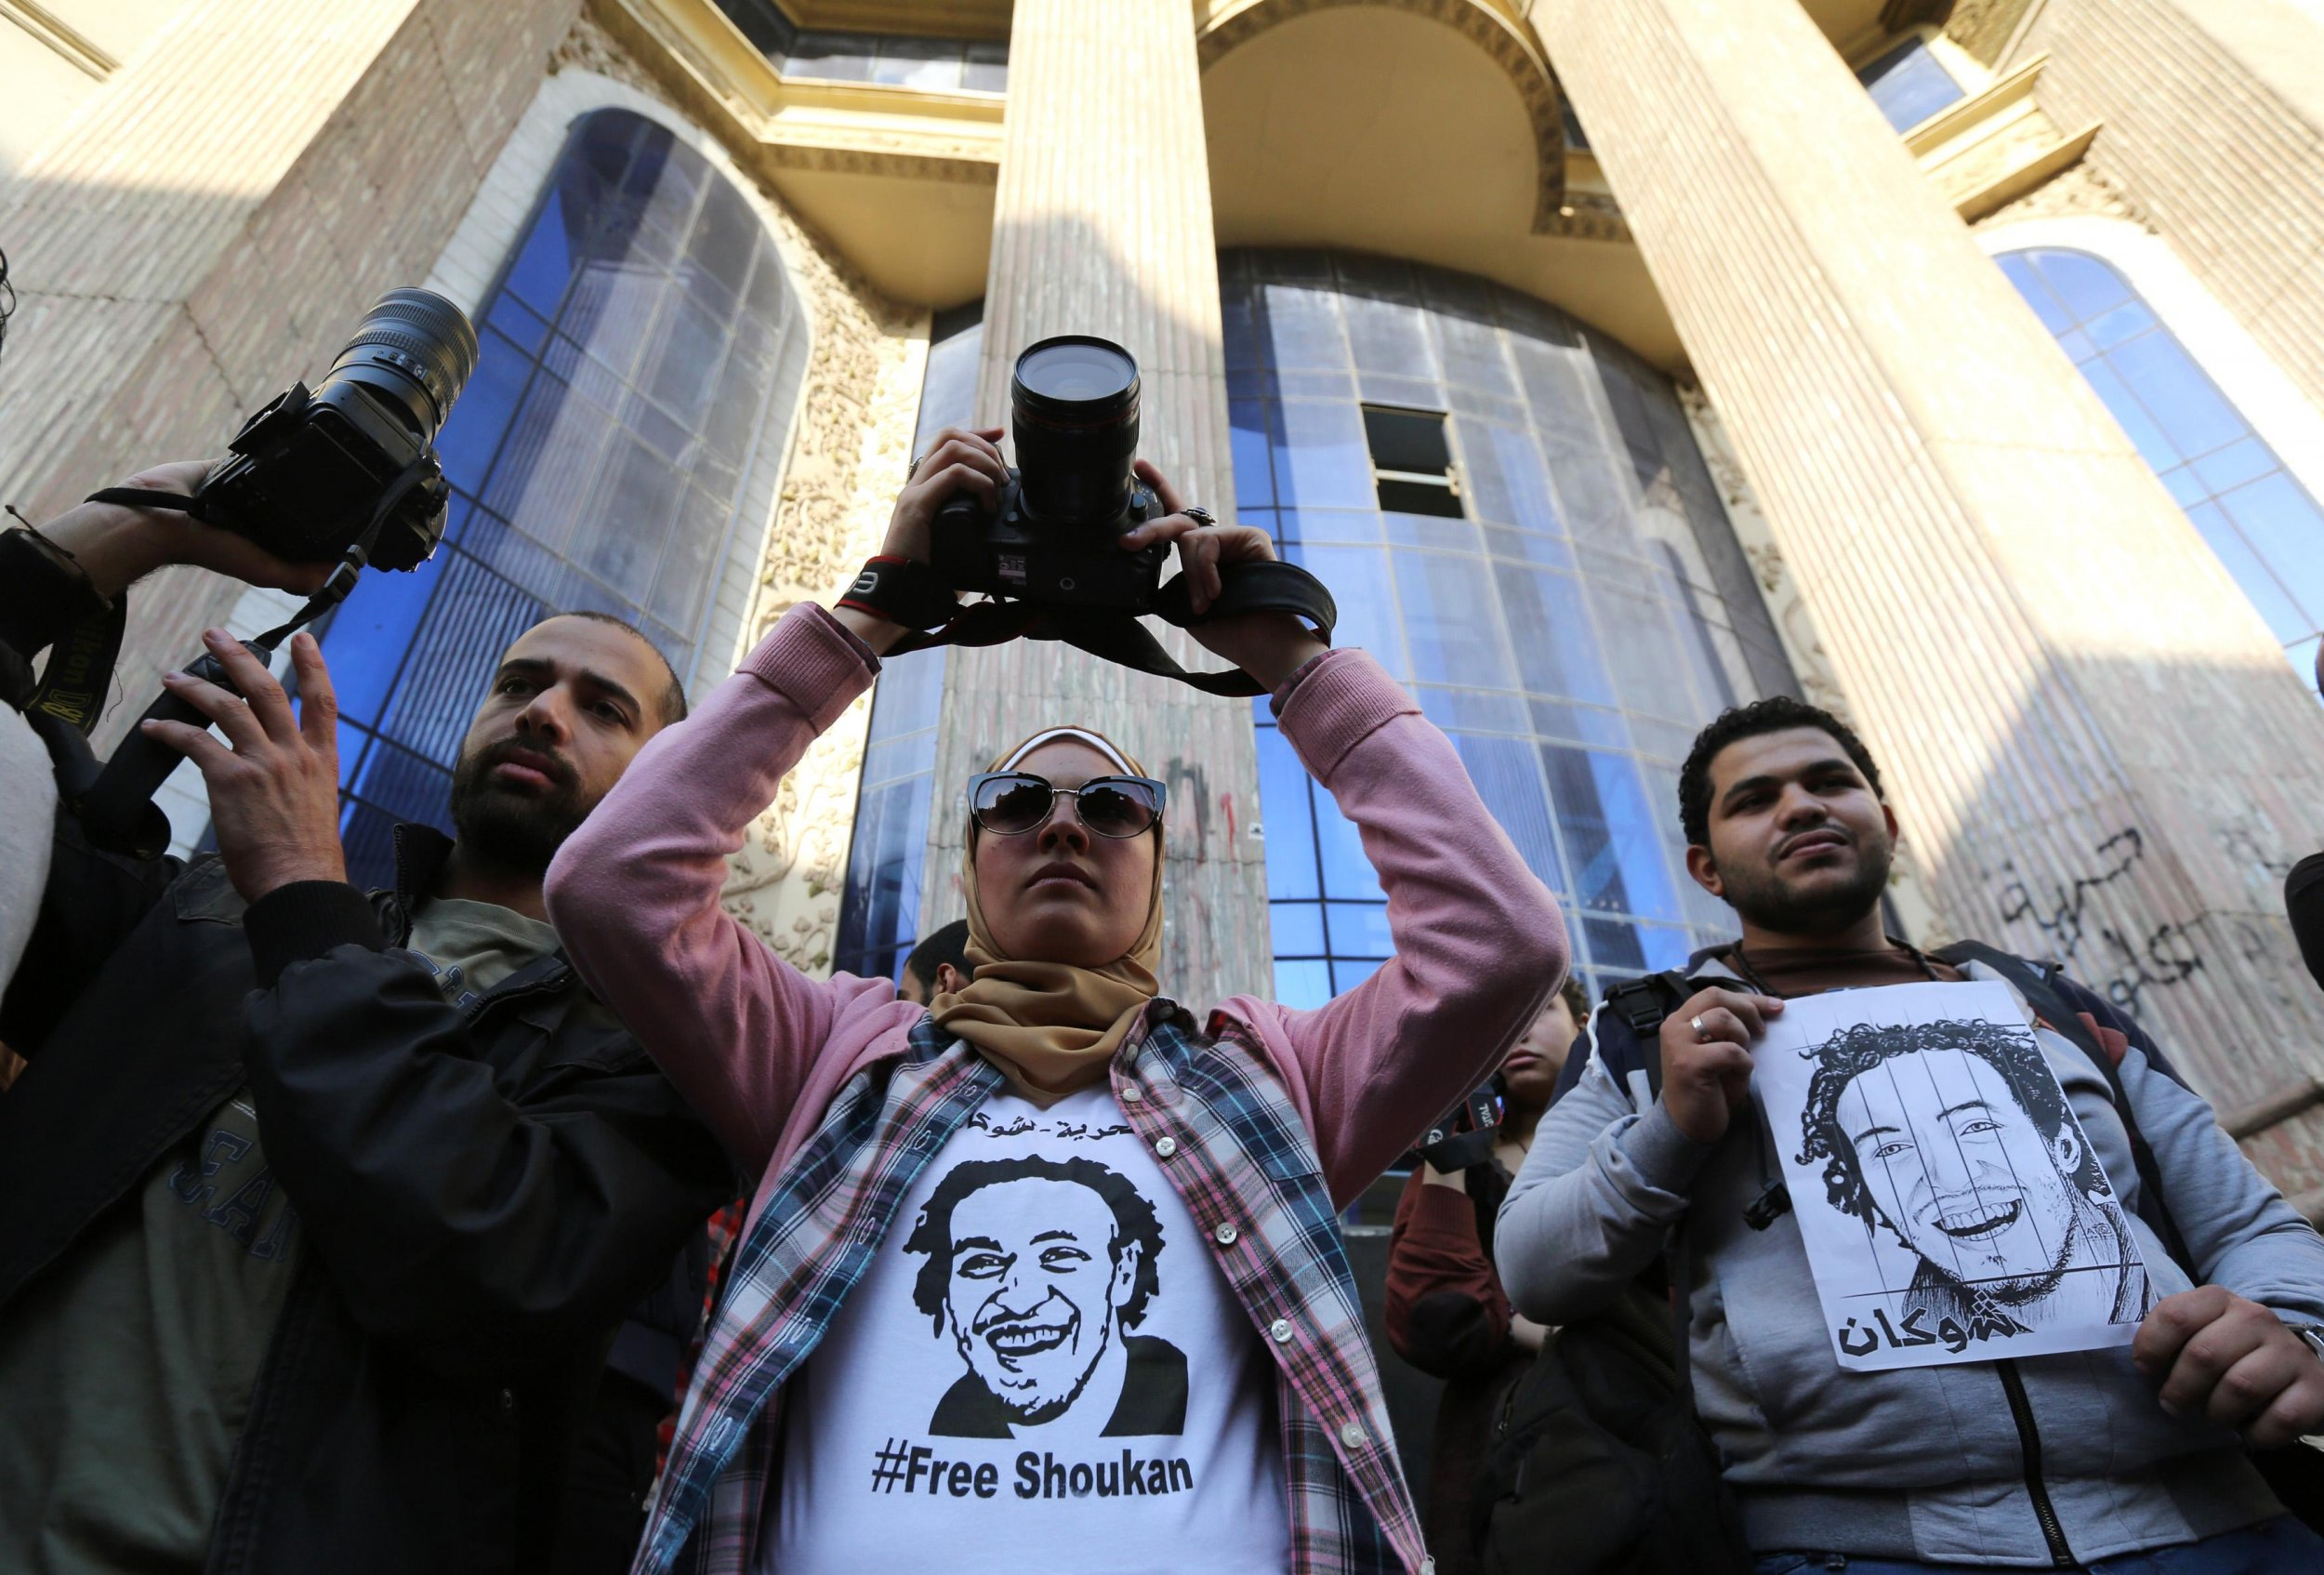 2015-02-08T152749Z_209263134_GM1EB281RTN01_RTRMADP_3_EGYPT-PROTEST